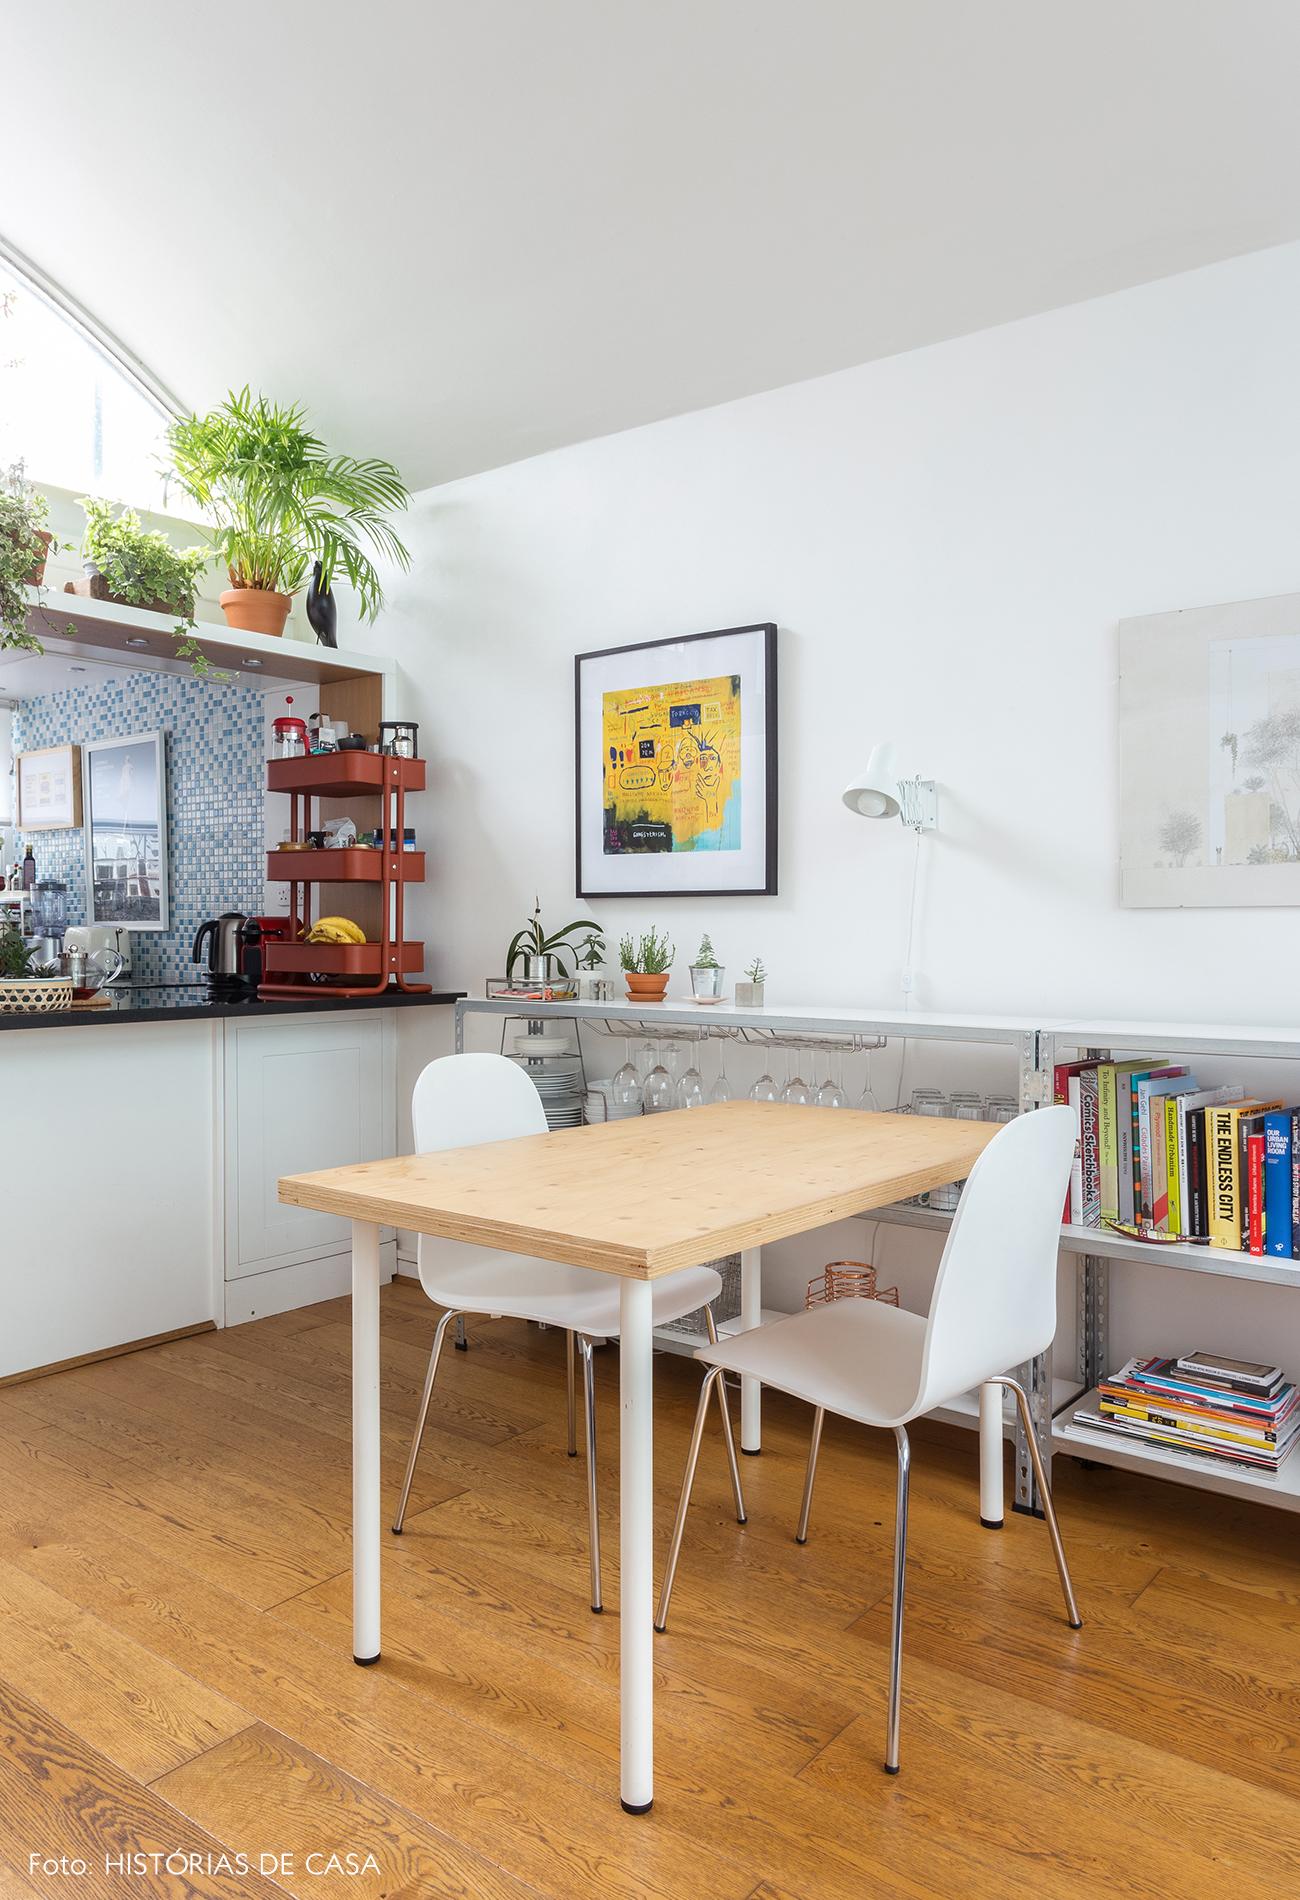 14-decoracao-apartamento-pequeno-sala-de-jantar-estantes